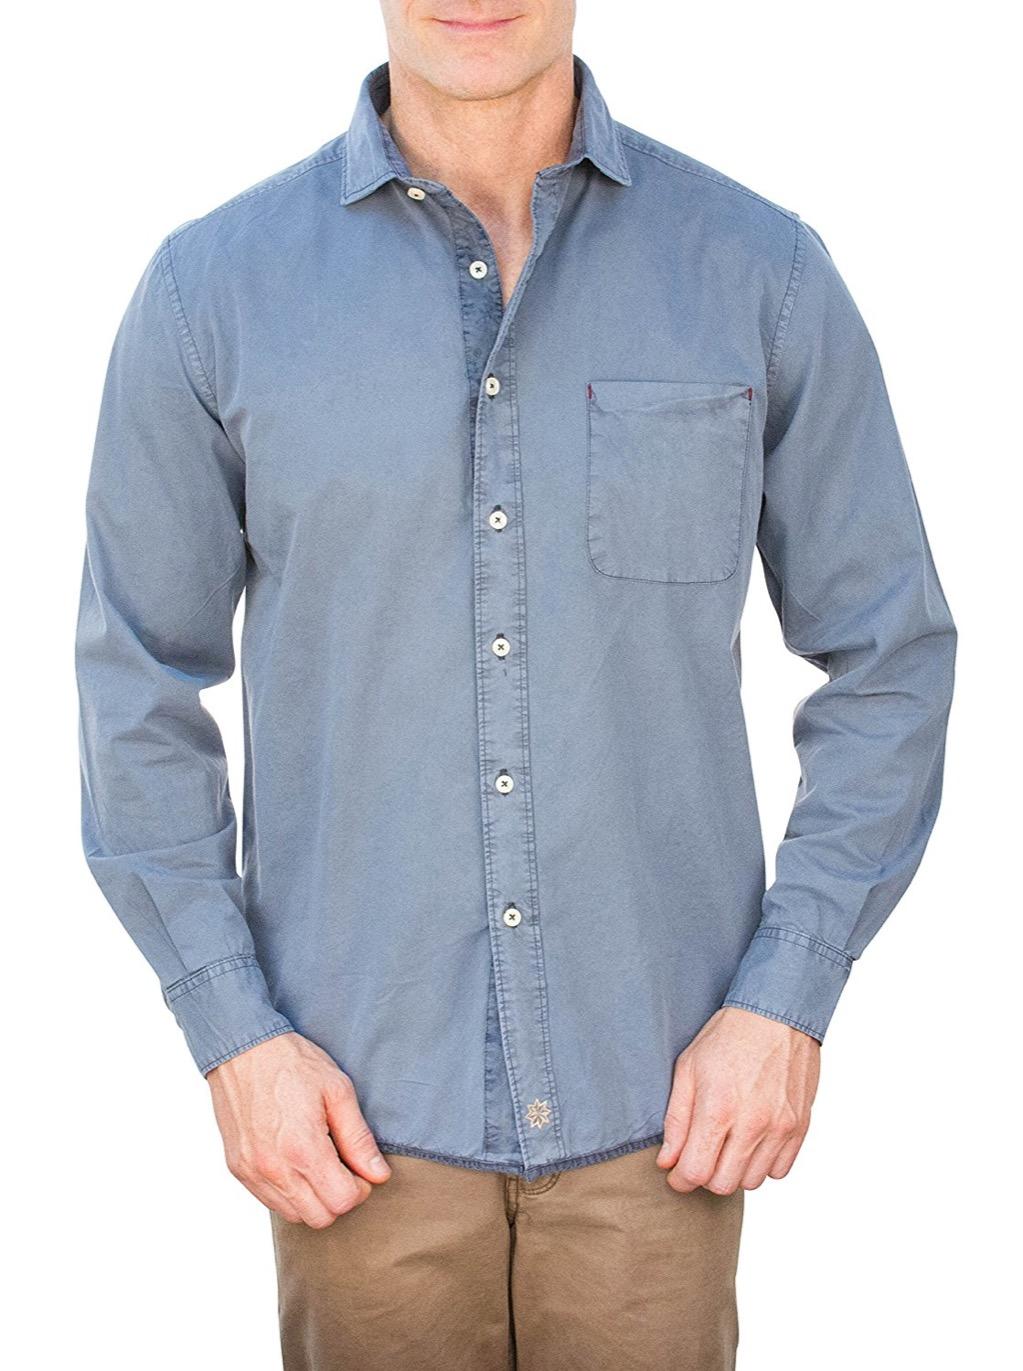 thaddeus grant untucked shirt